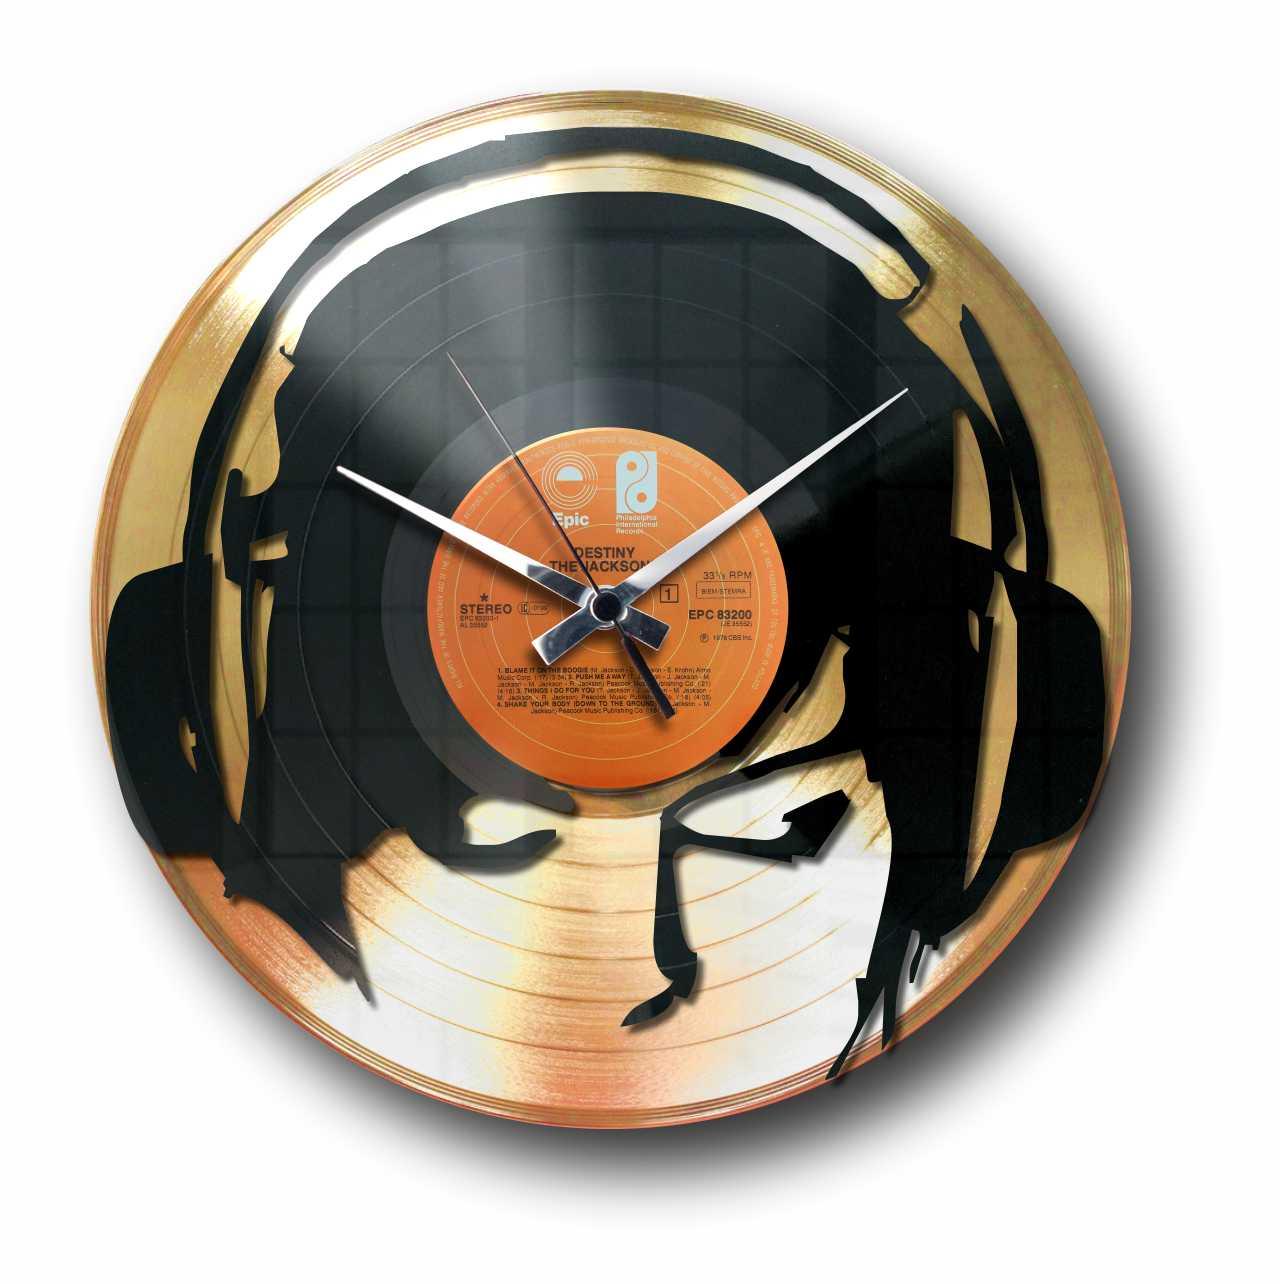 DJANE @ WORK - GOLD or SILVER VINYL RECORD WALL CLOCK